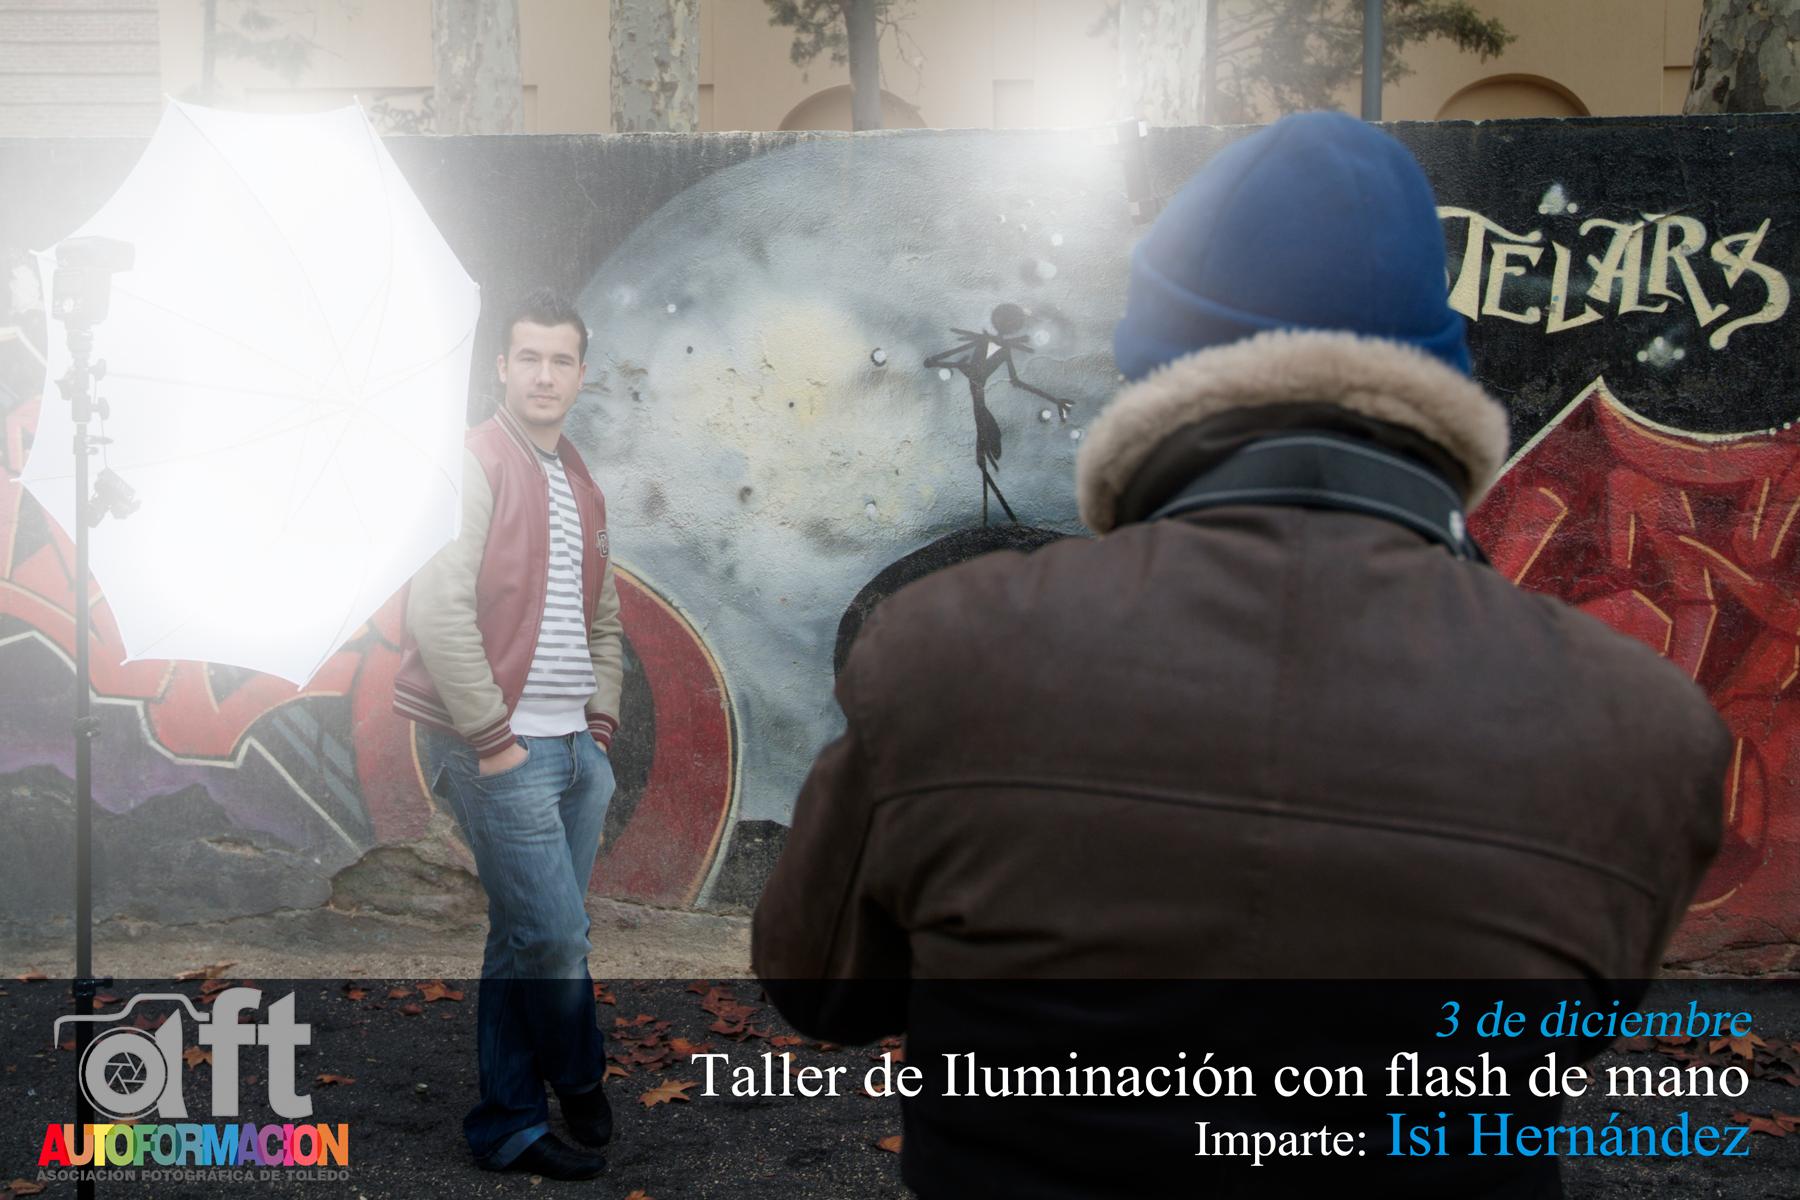 Taller de Iluminación con flash de mano, con Isi Hernández